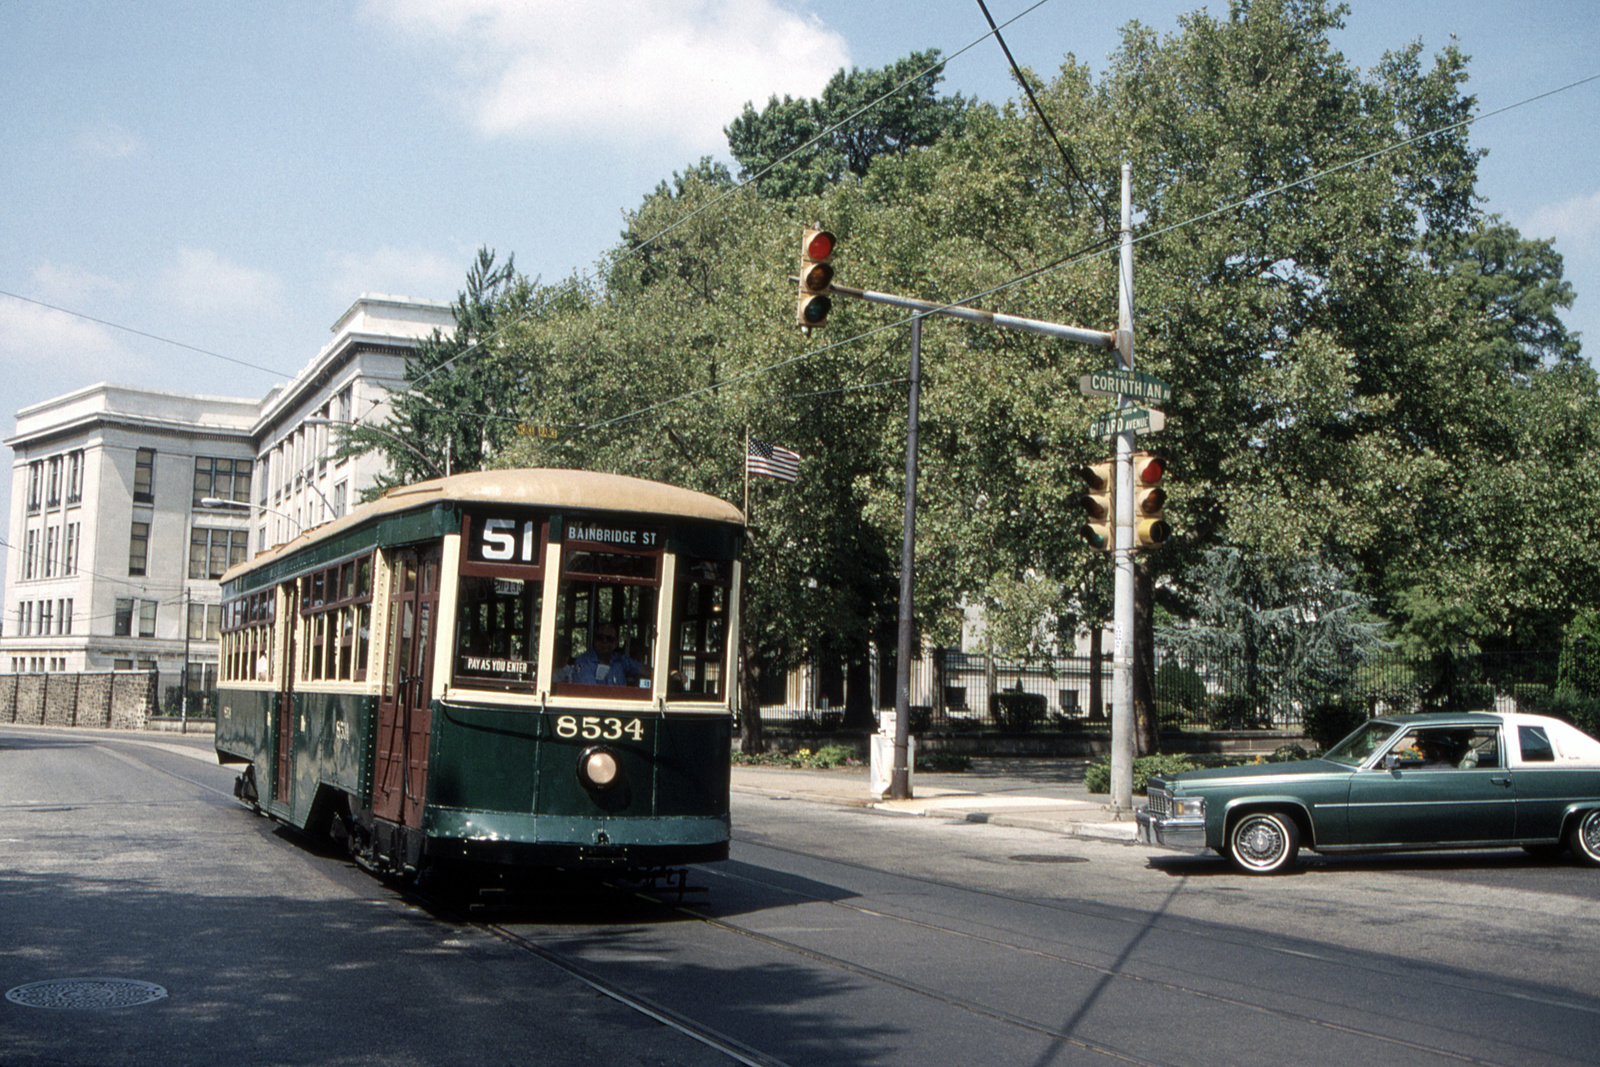 (1016k, 1600x1067)<br><b>Country:</b> United States<br><b>City:</b> Philadelphia, PA<br><b>System:</b> SEPTA (or Predecessor)<br><b>Line:</b> Rt. 15-Girard<br><b>Location:</b> Girard/S. College/Corinthian<br><b>Route:</b> Fan Trip<br><b>Car:</b> PTC 8534 <br><b>Collection of:</b> David Pirmann<br><b>Date:</b> 8/27/1995<br><b>Viewed (this week/total):</b> 0 / 69